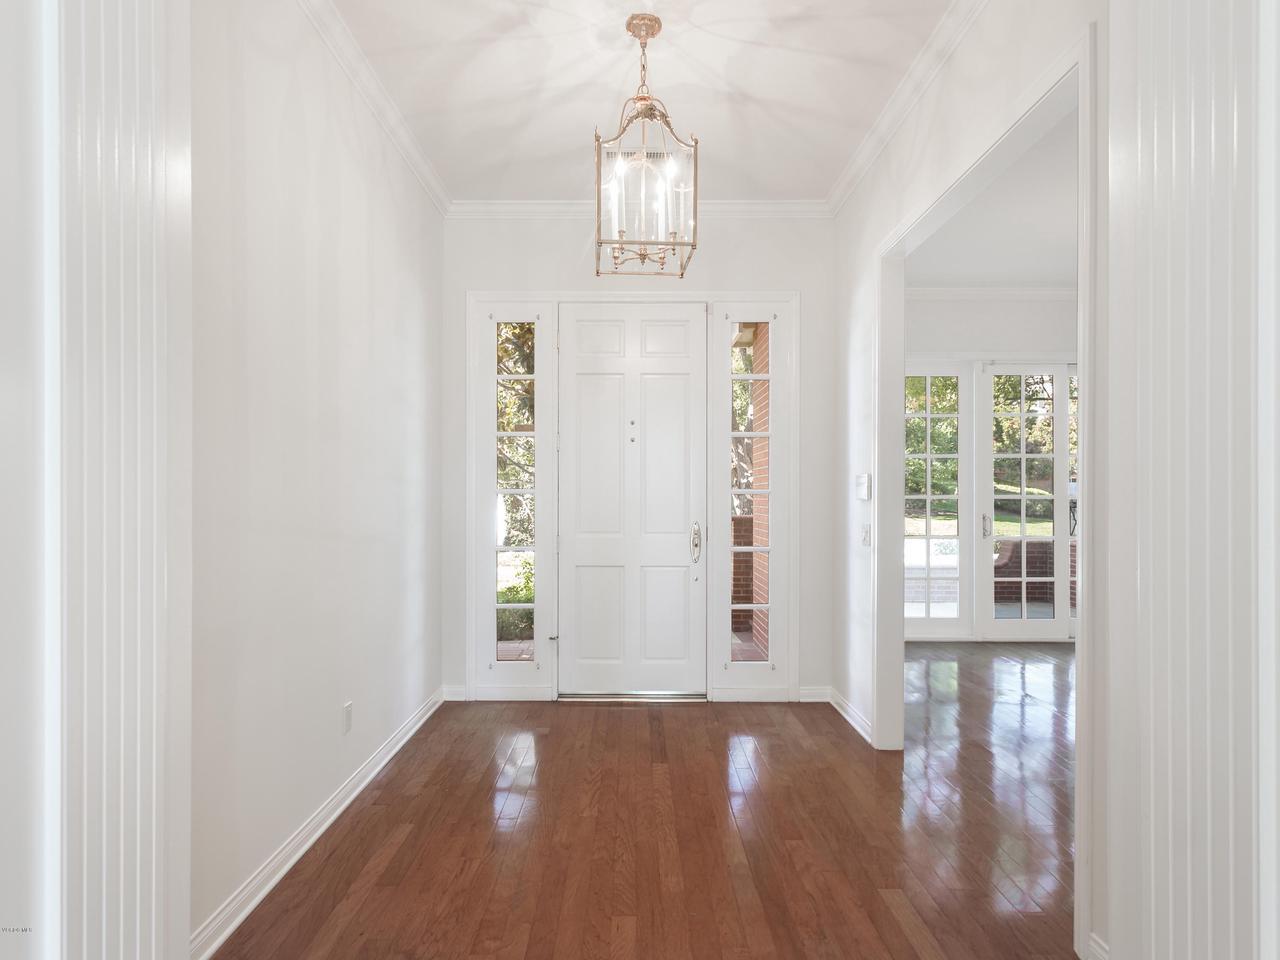 2438 WALDEMAR, Thousand Oaks, CA 91361 - IMG_1910